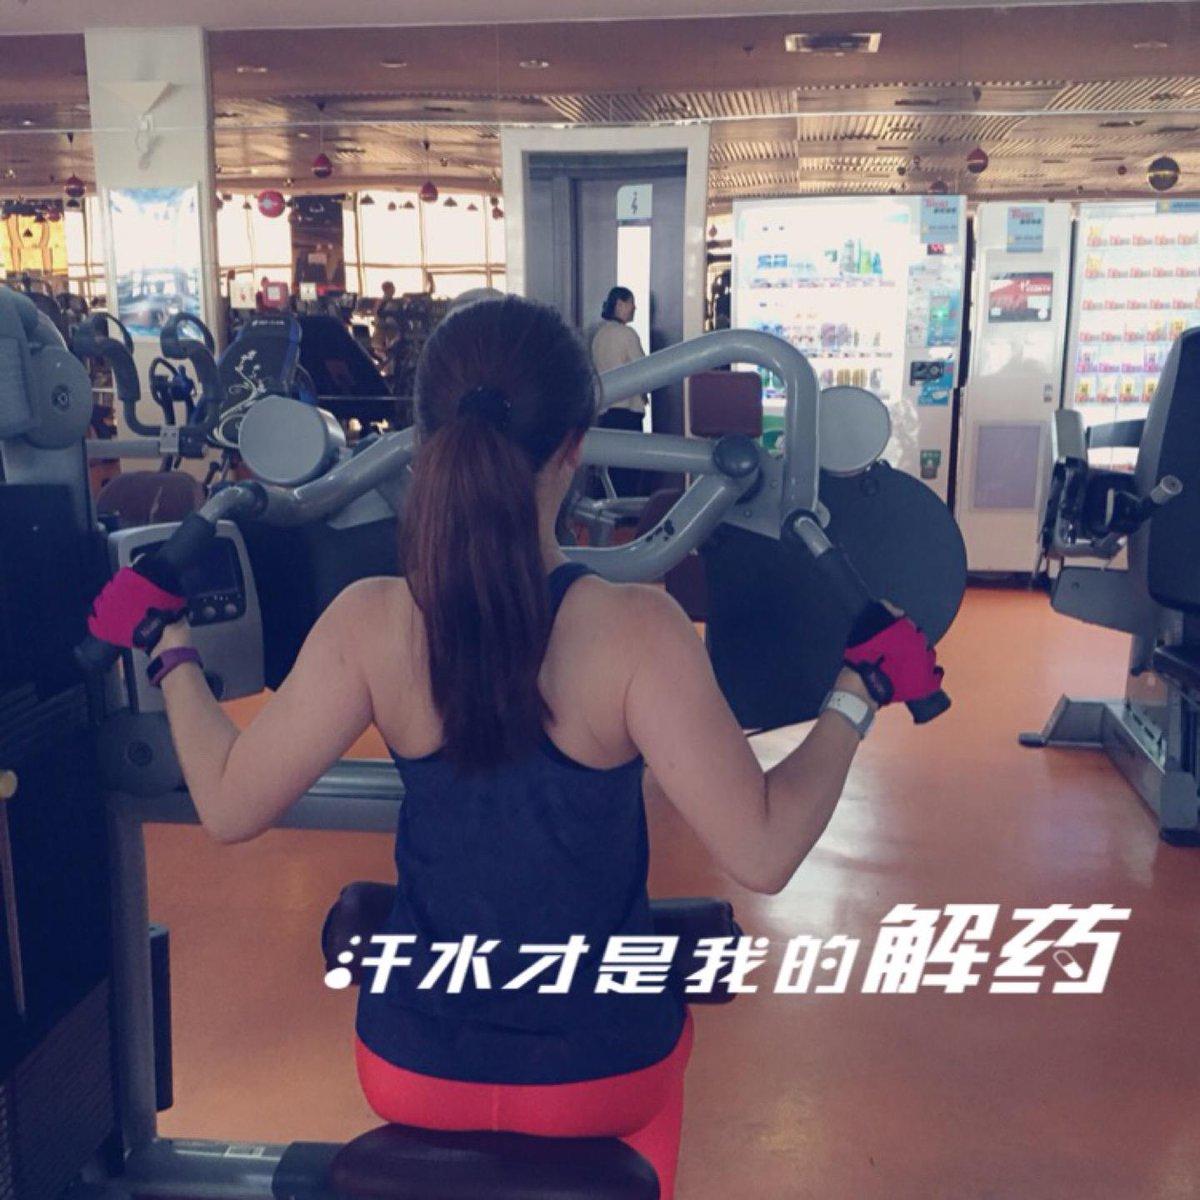 I'm at 一兆韦德健身会所 | Tera Wellness Club in Shanghai https://t.co/29Ym2pSyHP http://t.co/o2yuwUDFfV